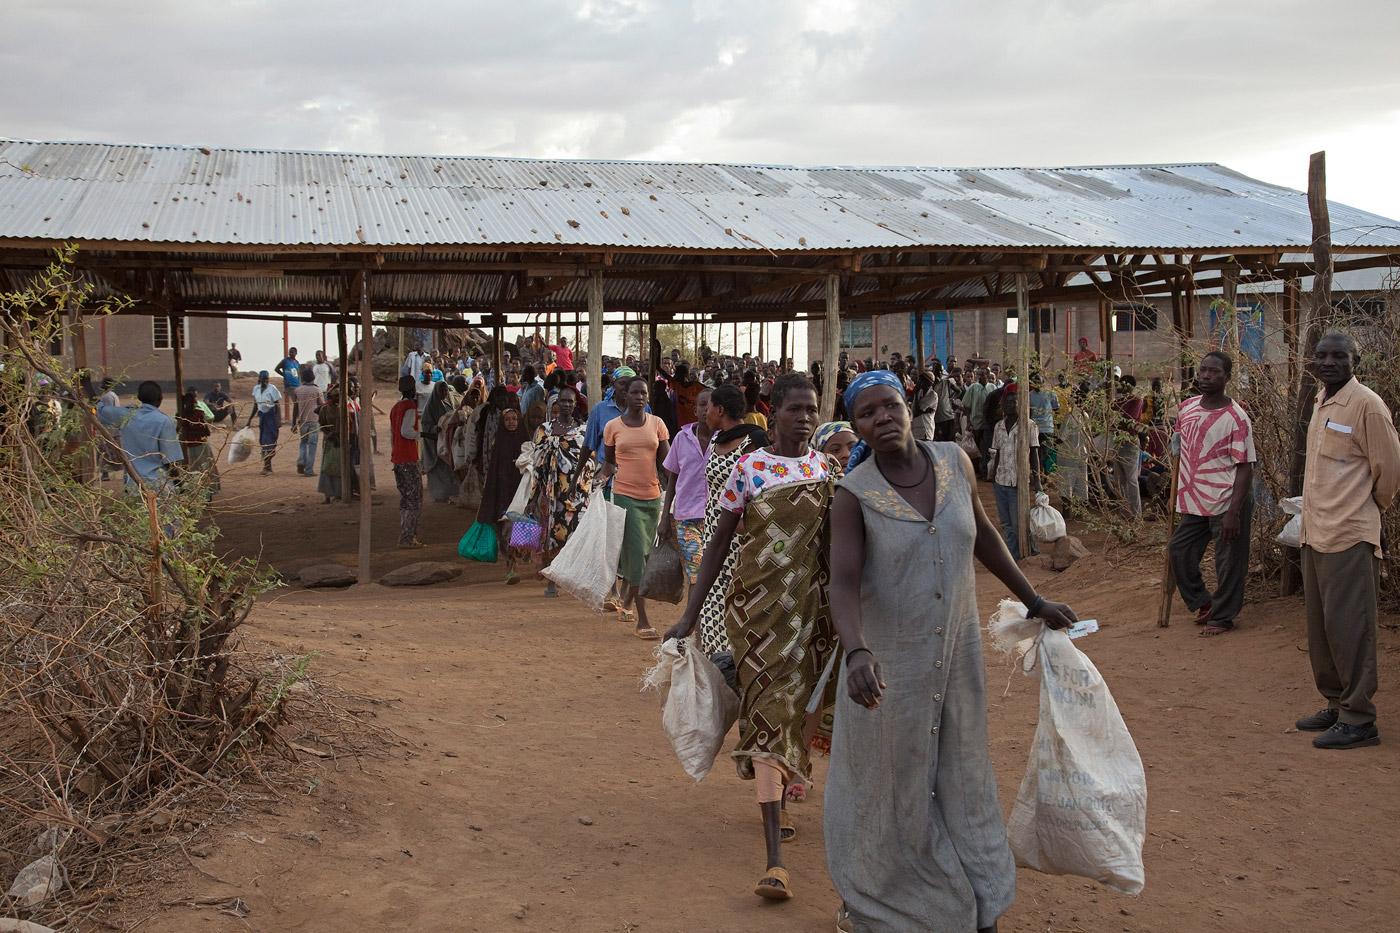 kakuma refugee camp globalviewsdk world images